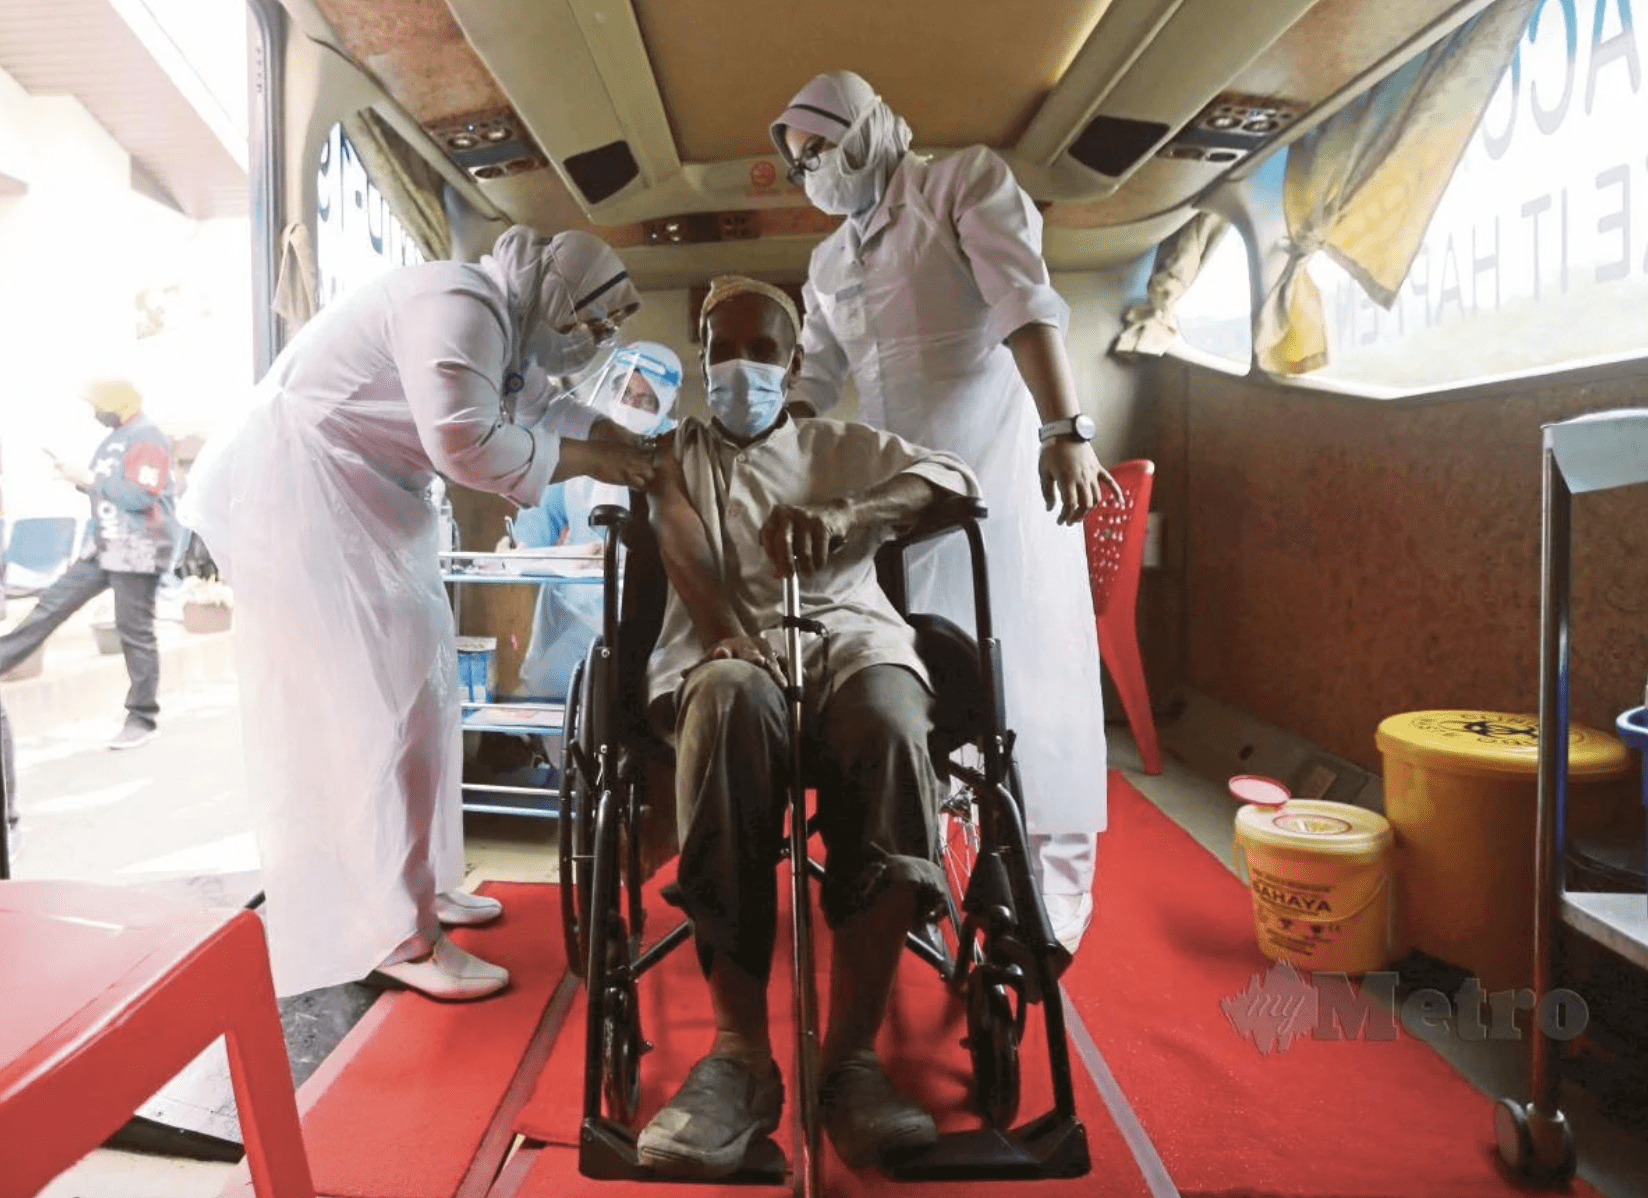 Man clarifies viral story about walking 35km - vaccination